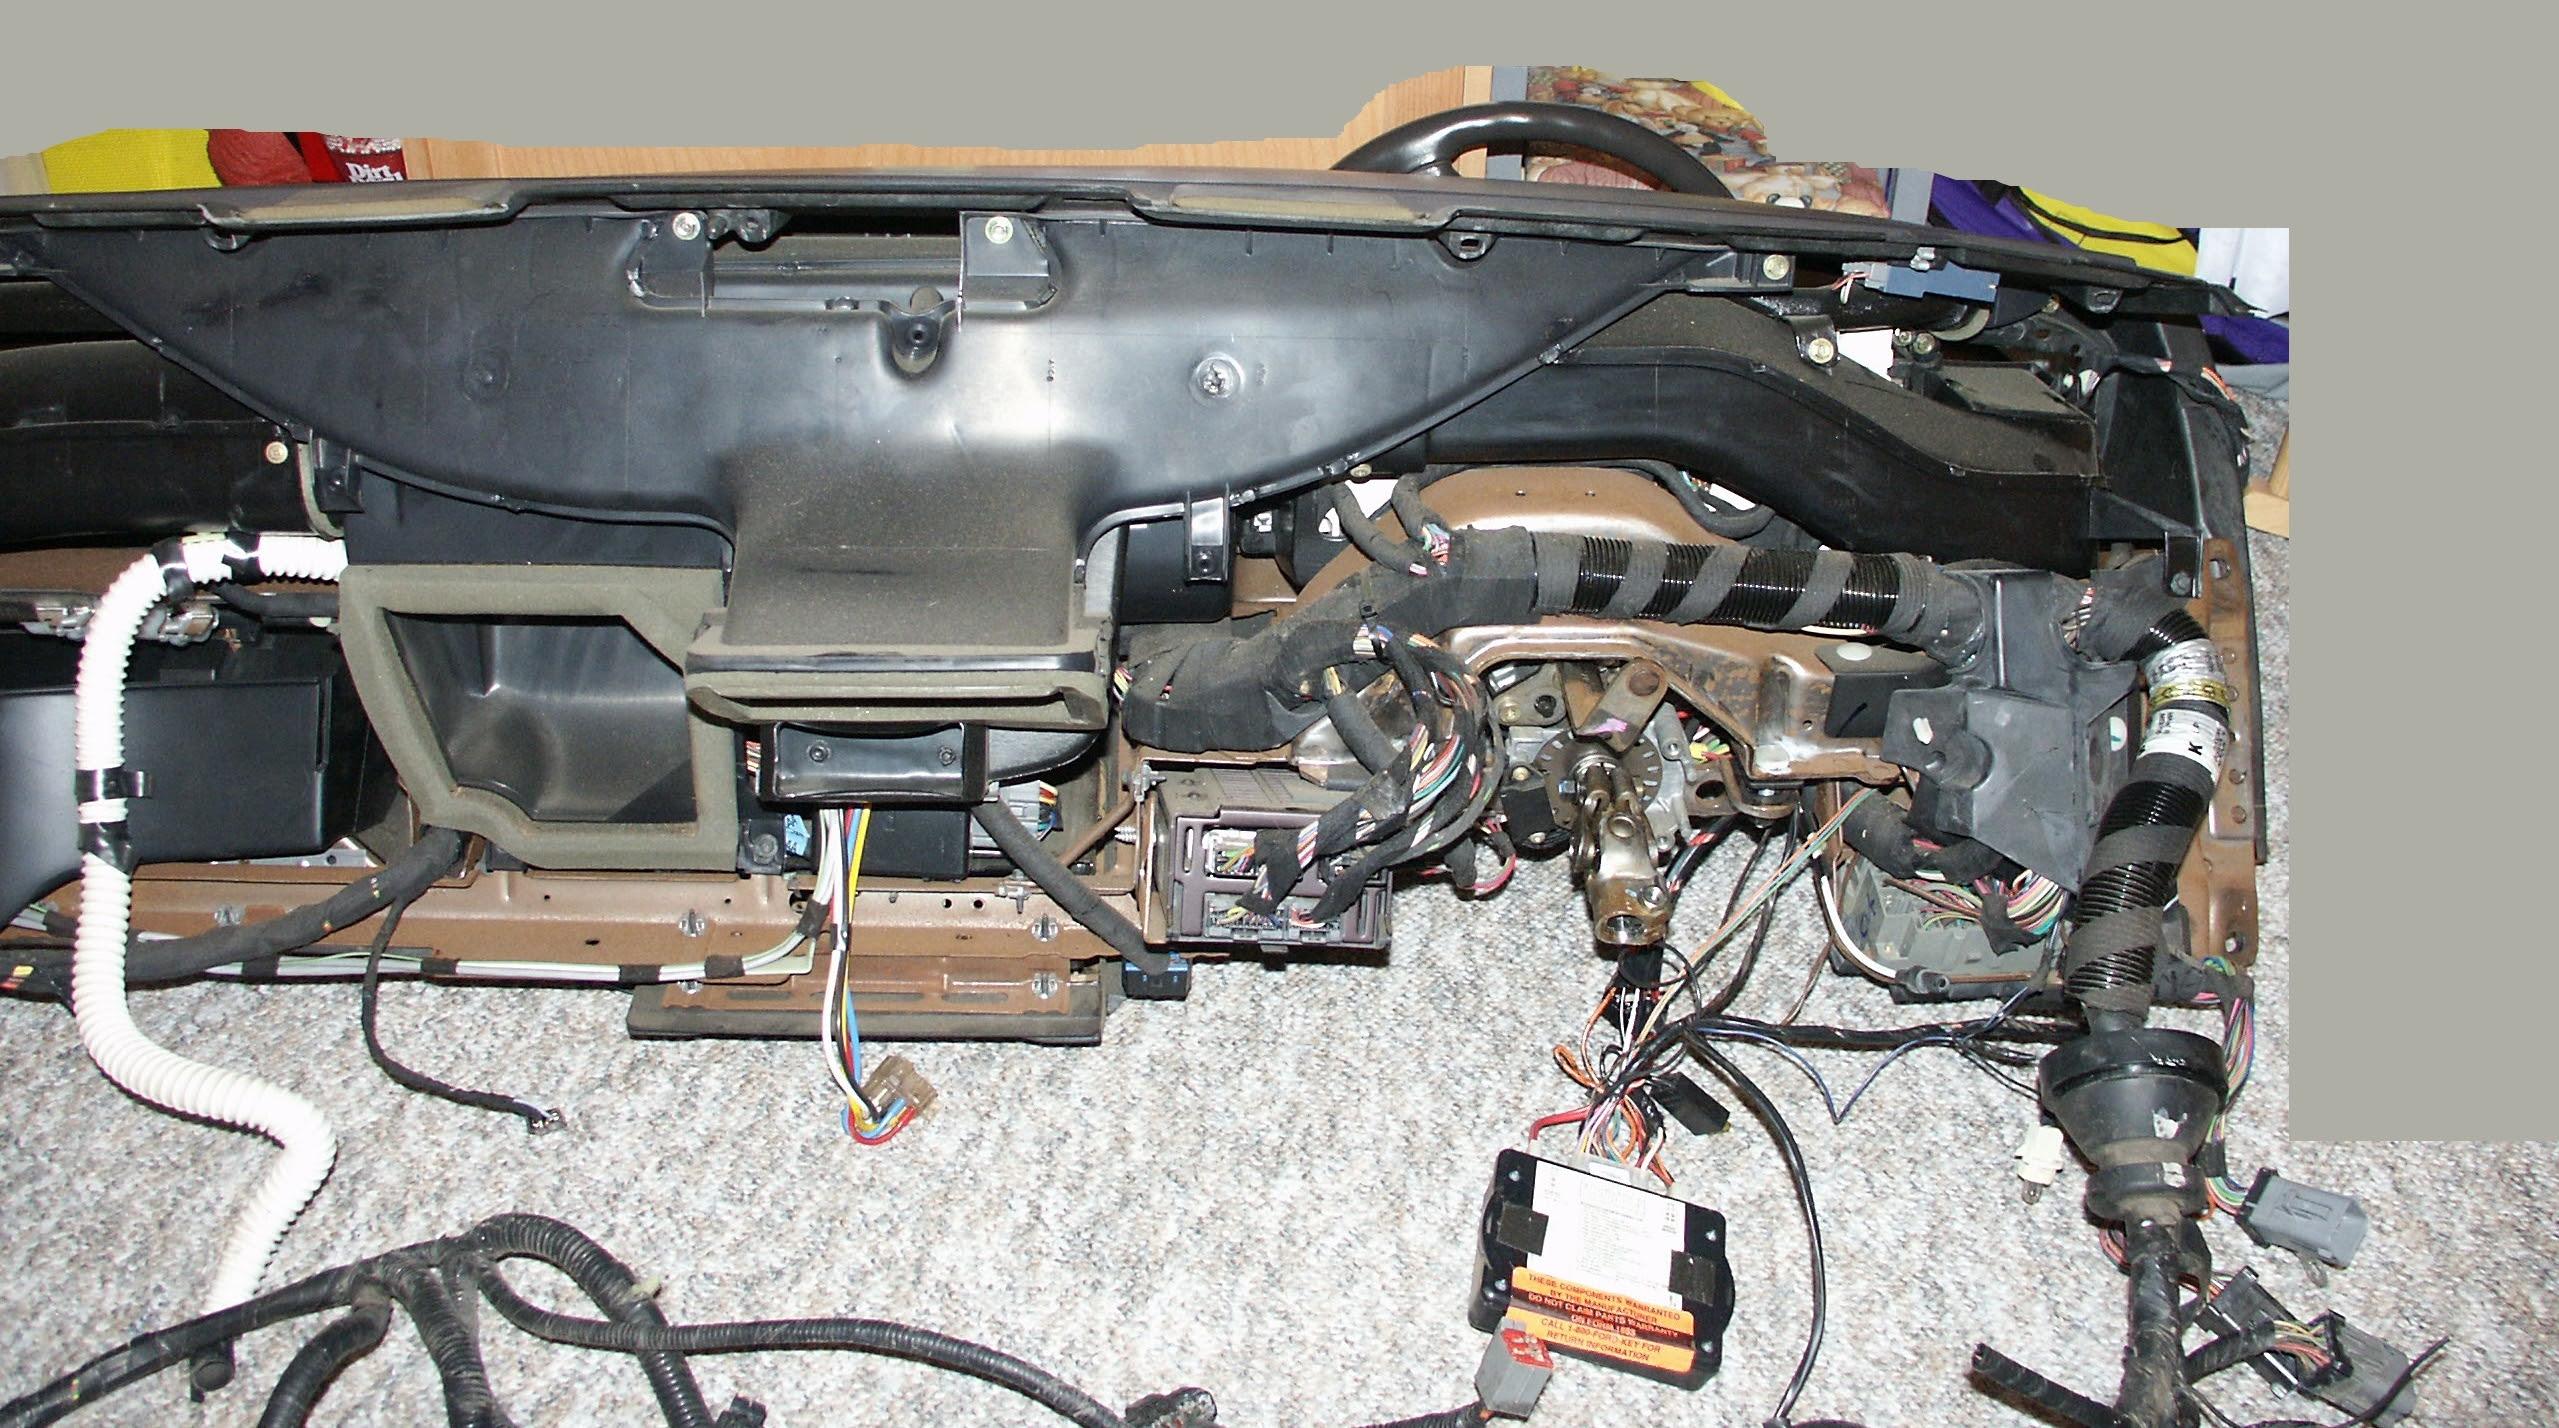 1999 Ford F 150 Blower Motor Wiring Diagram Winnebago Electrical Wiring Diagrams Vga Ab16 Jeanjaures37 Fr